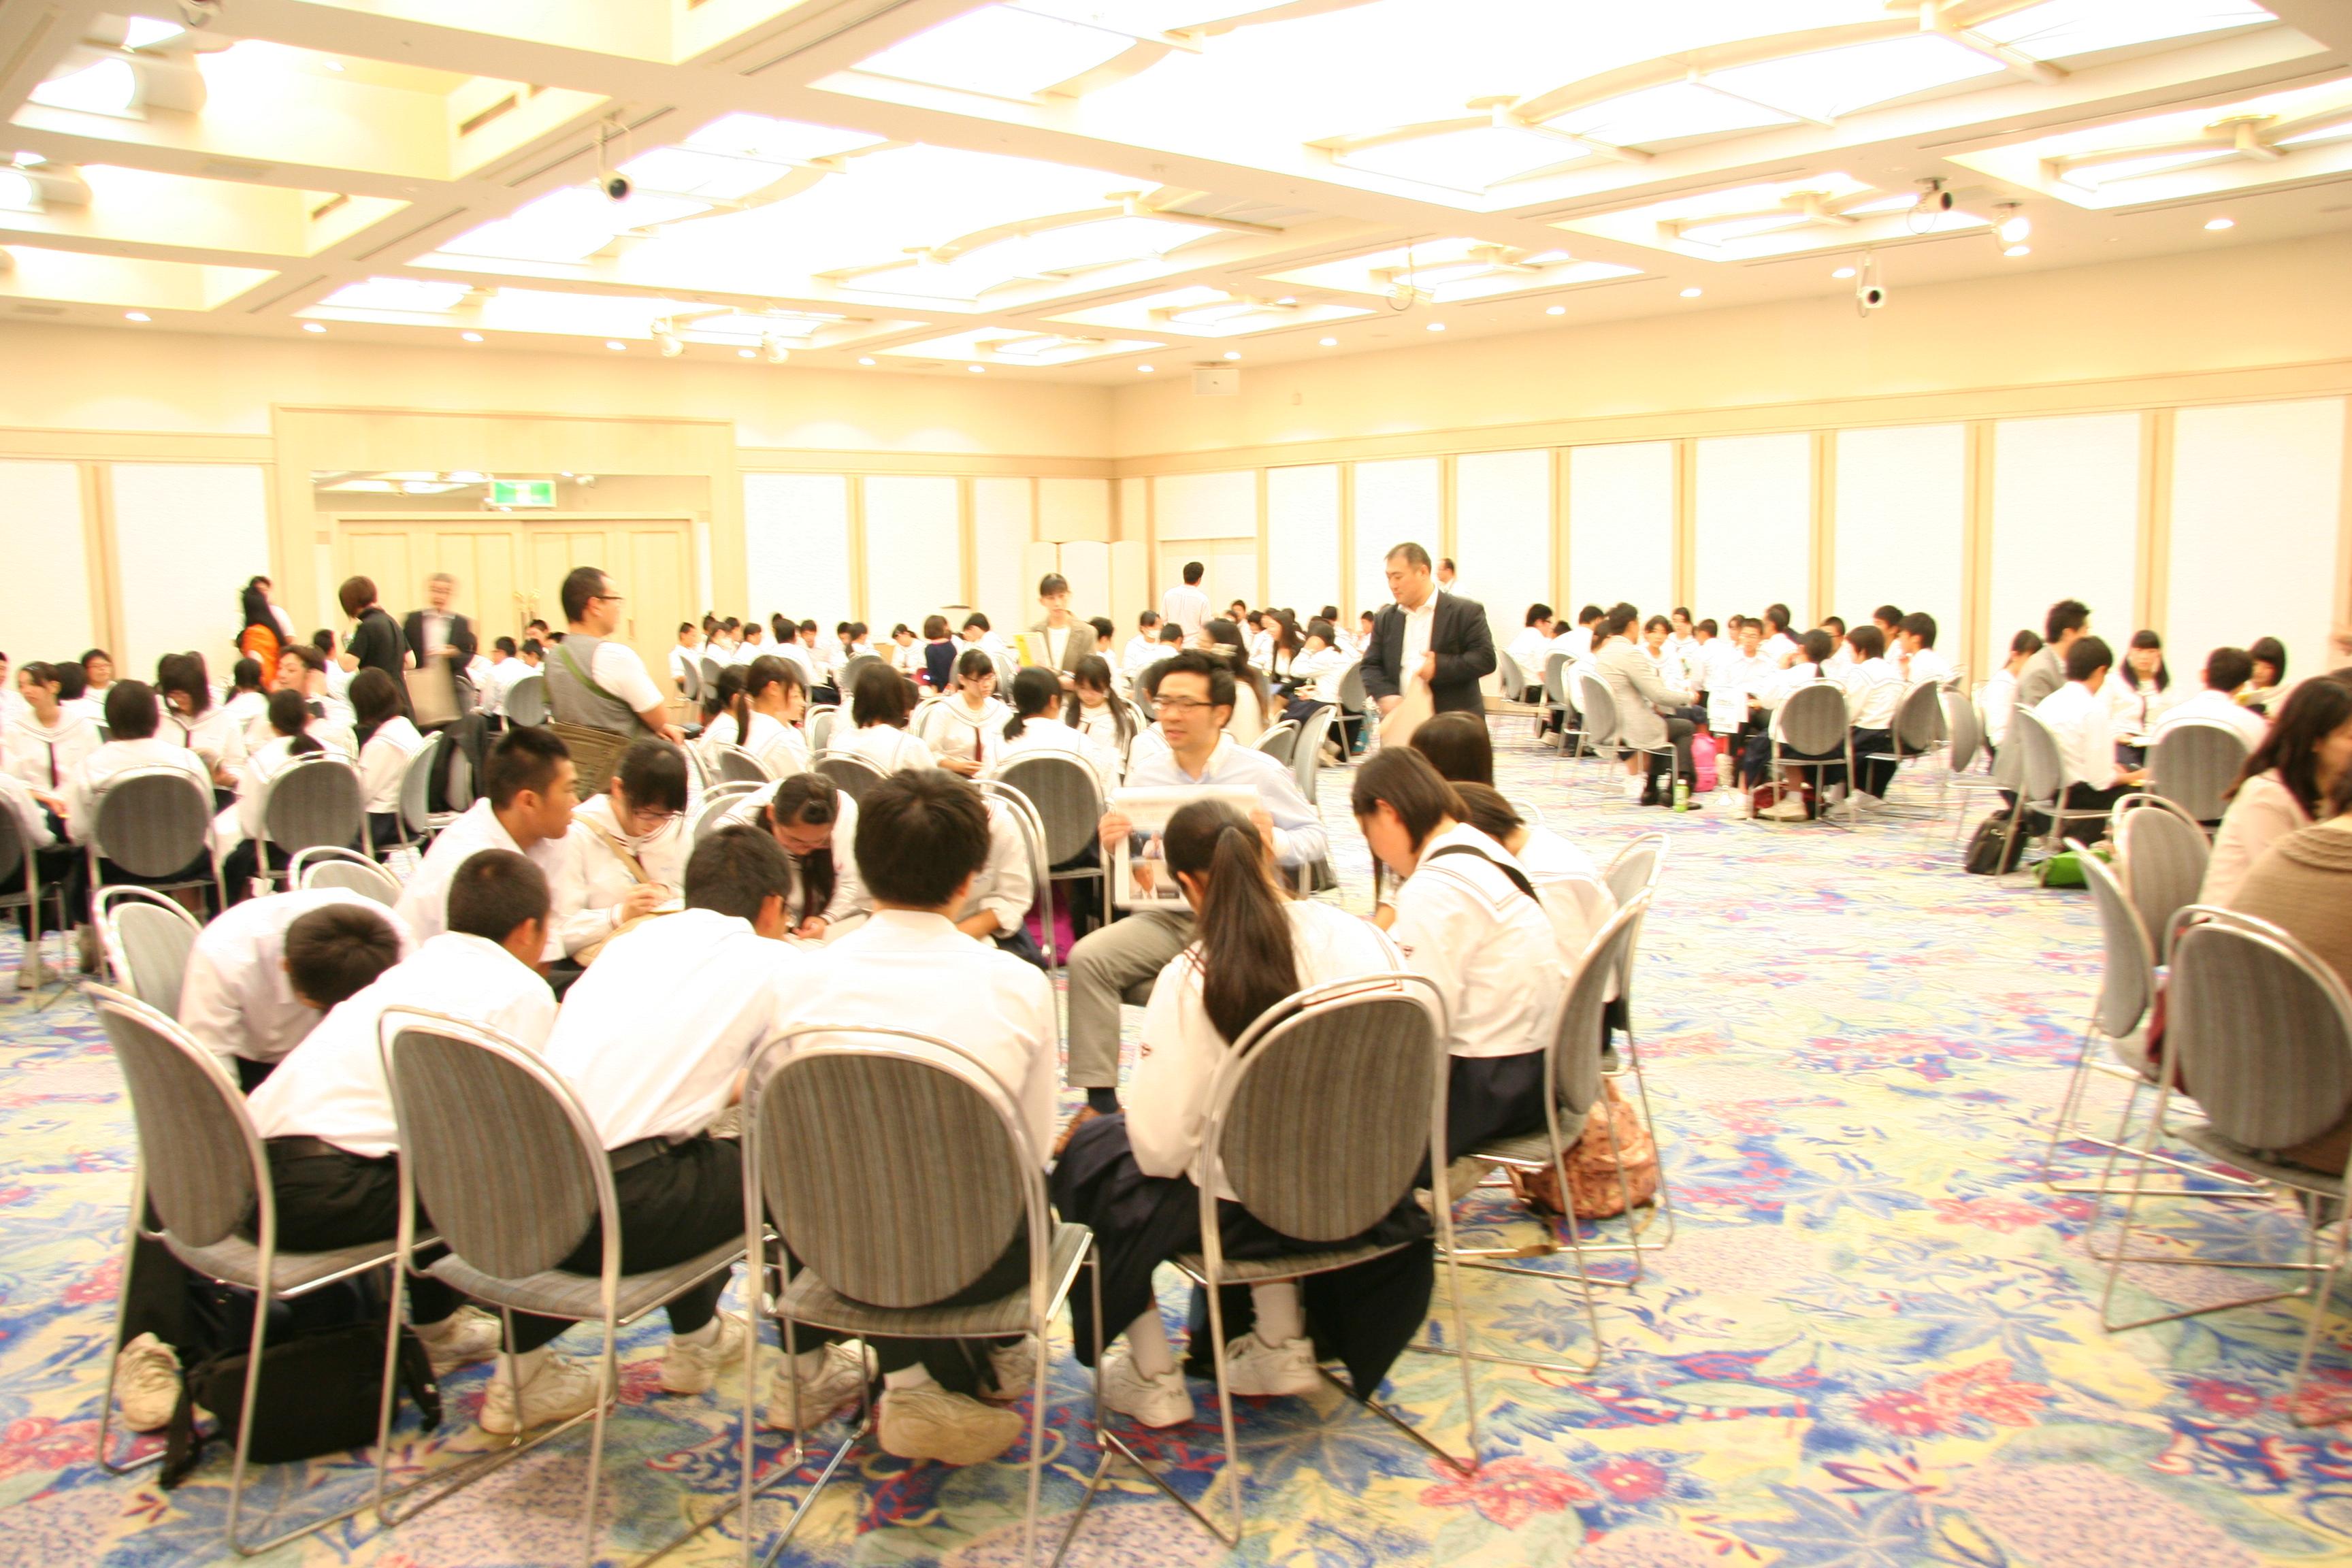 IMG 7527 - アオスキ主催東北中学校(修学旅行)に夢を与える時間